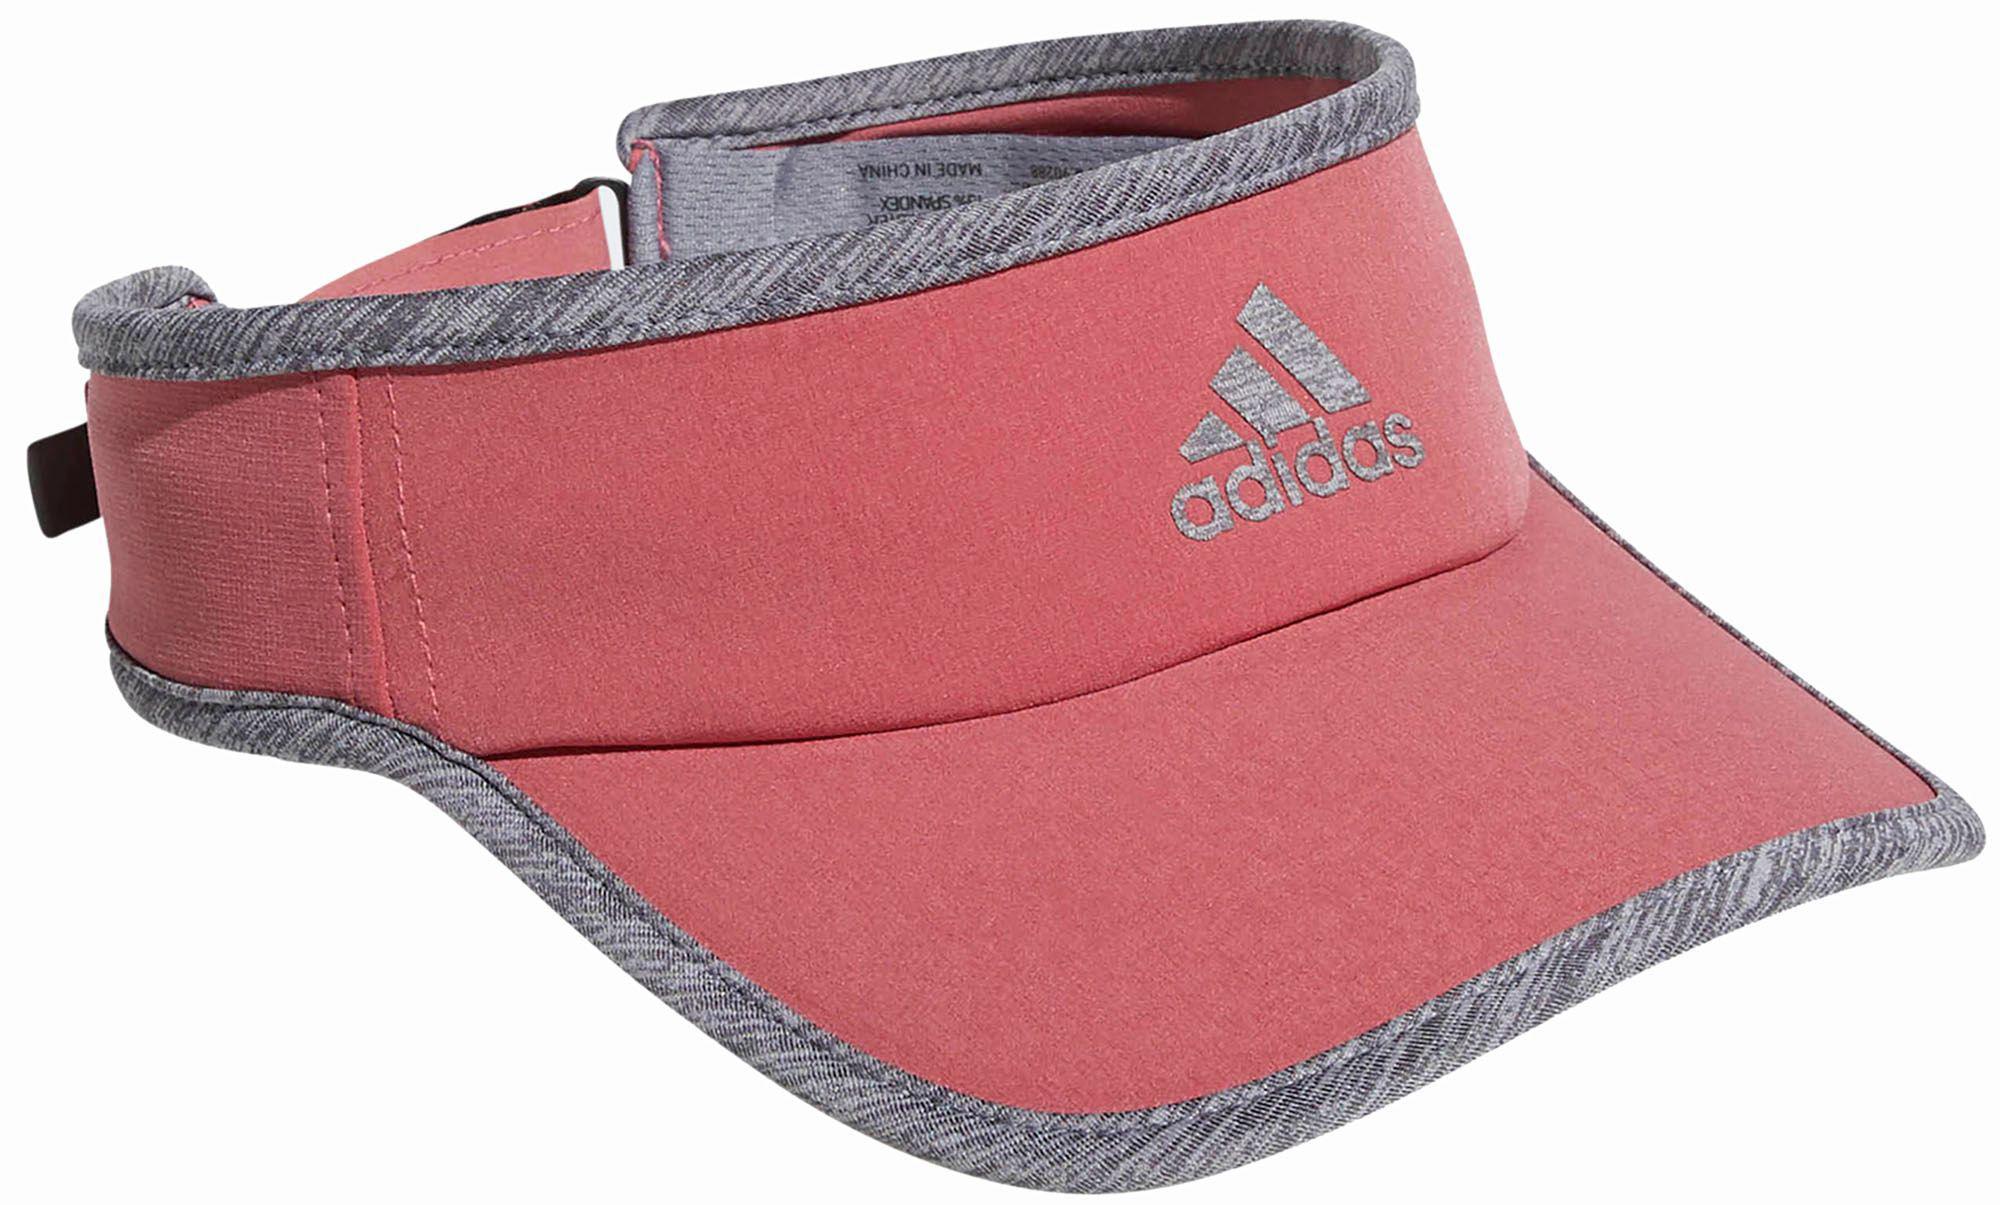 a41d22d5f0c Lyst - Adidas Superlite Visor